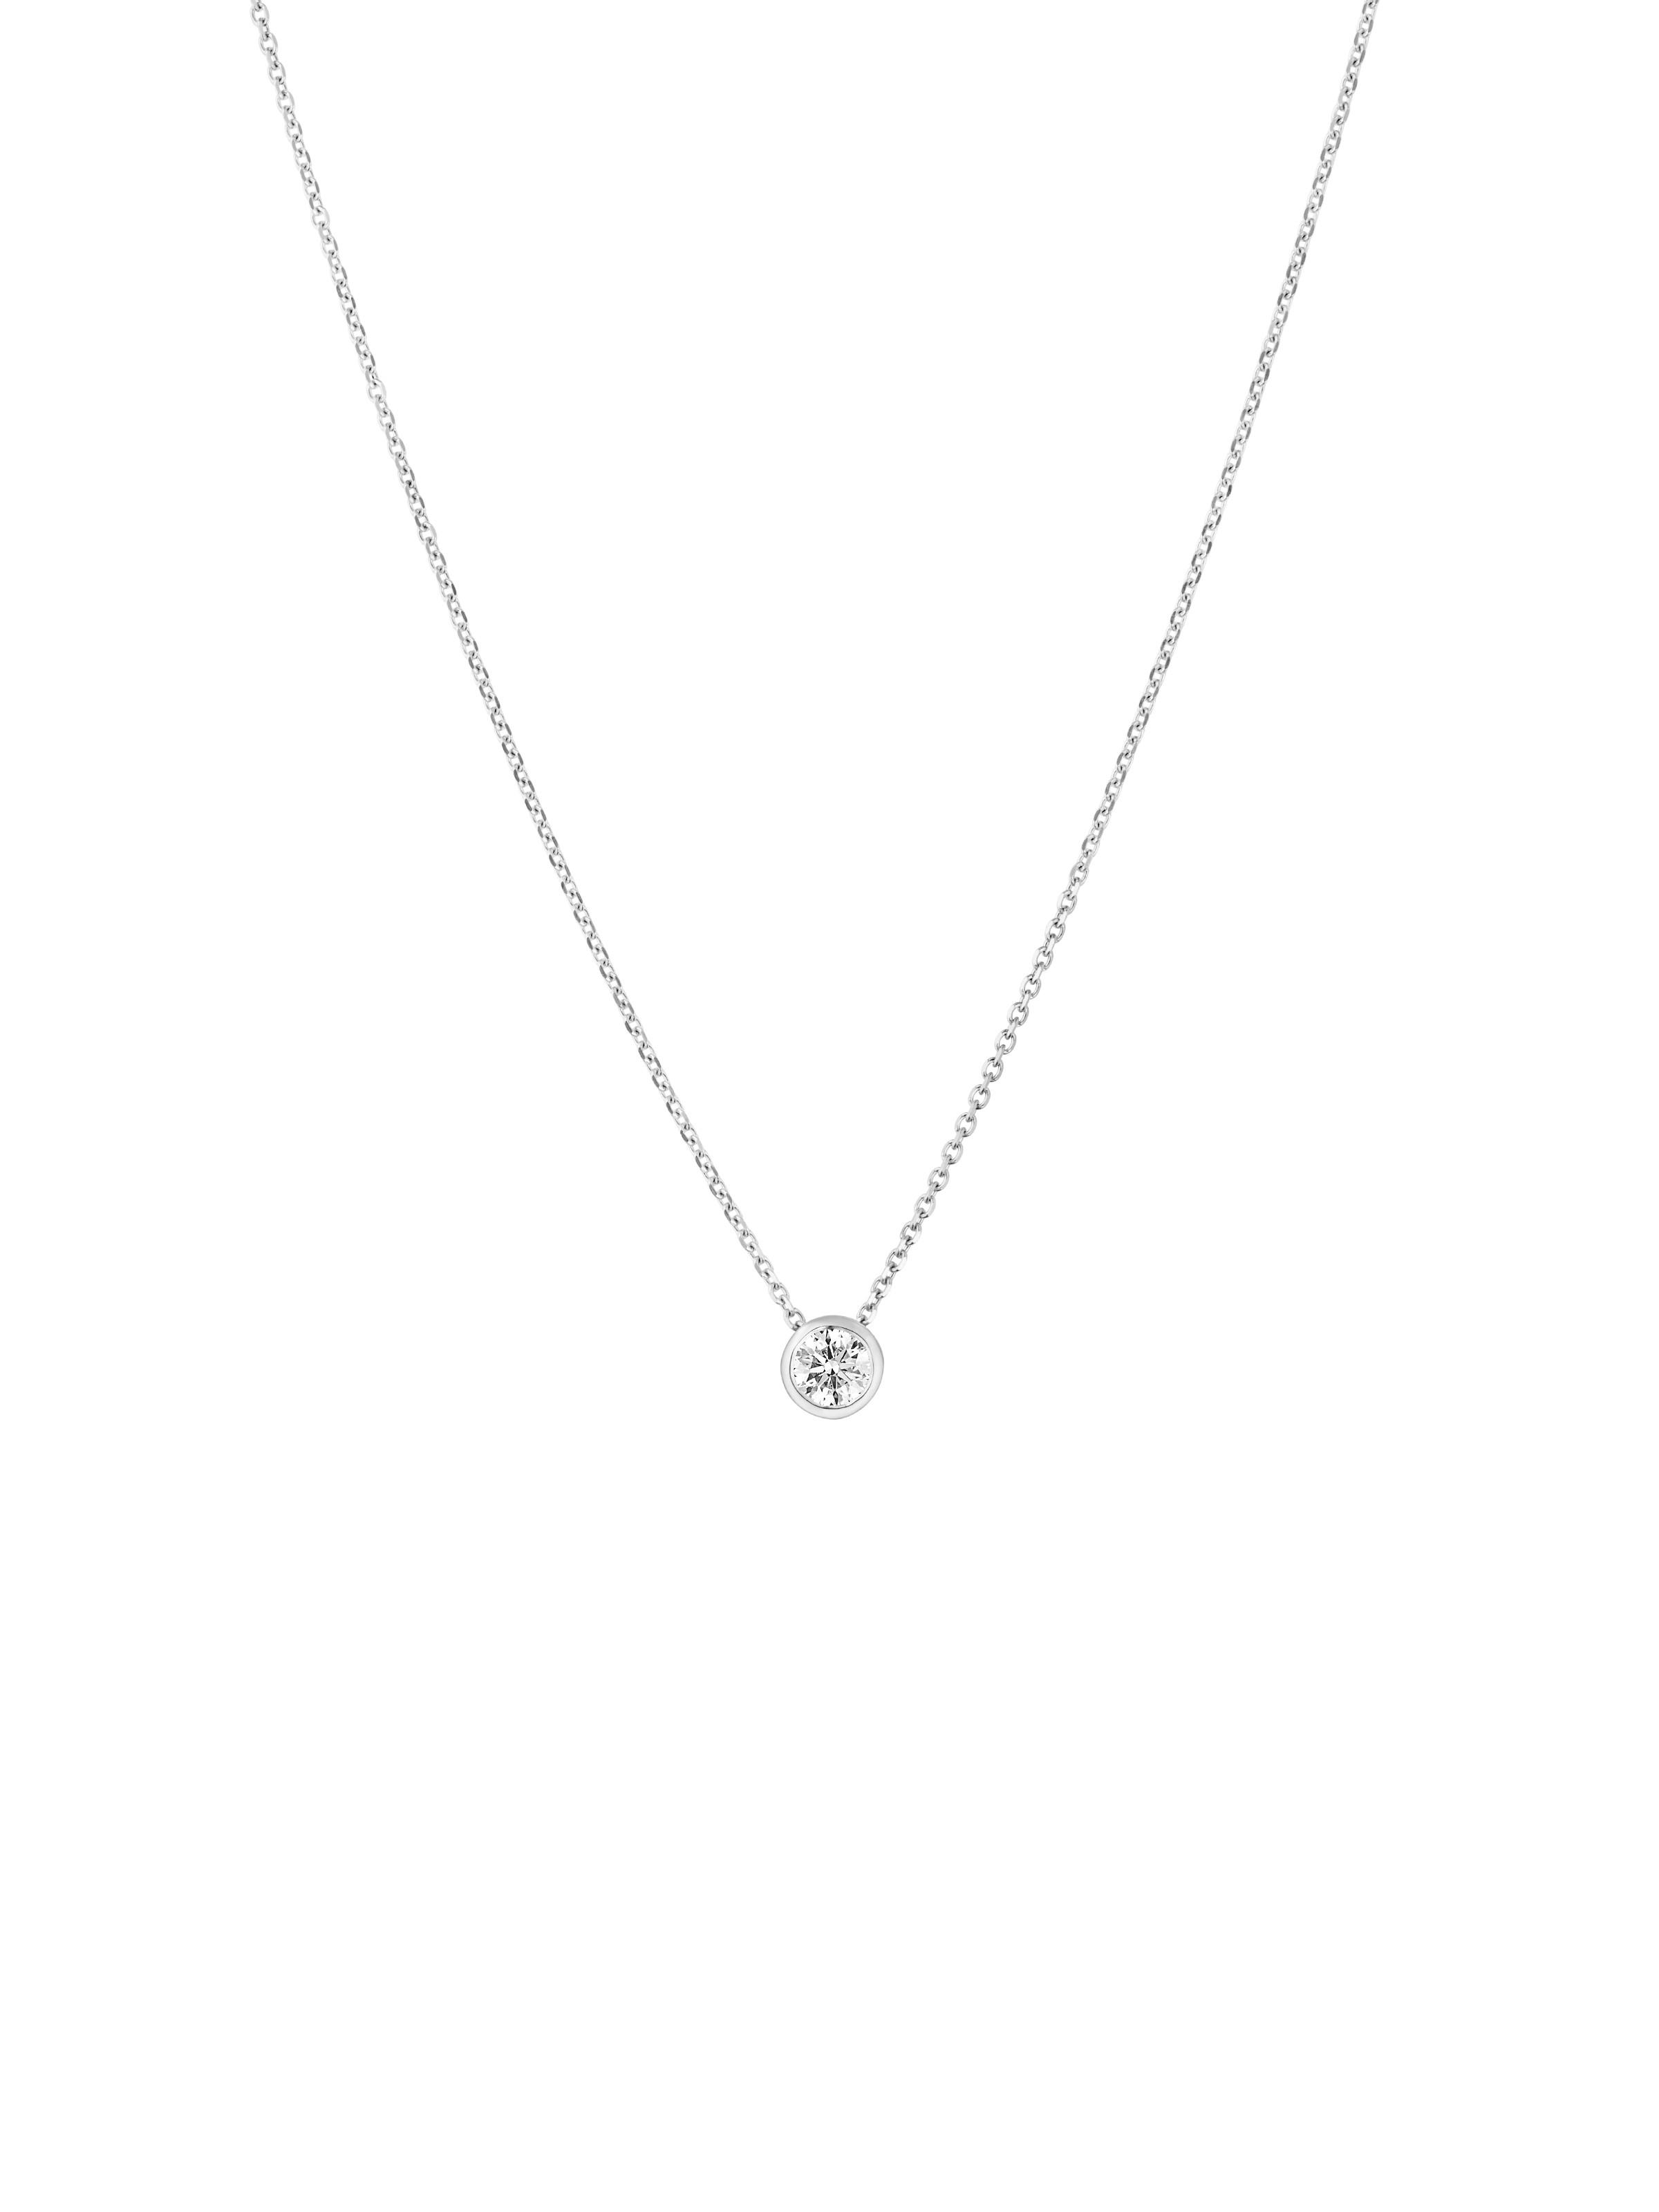 One Moonwalk pendant